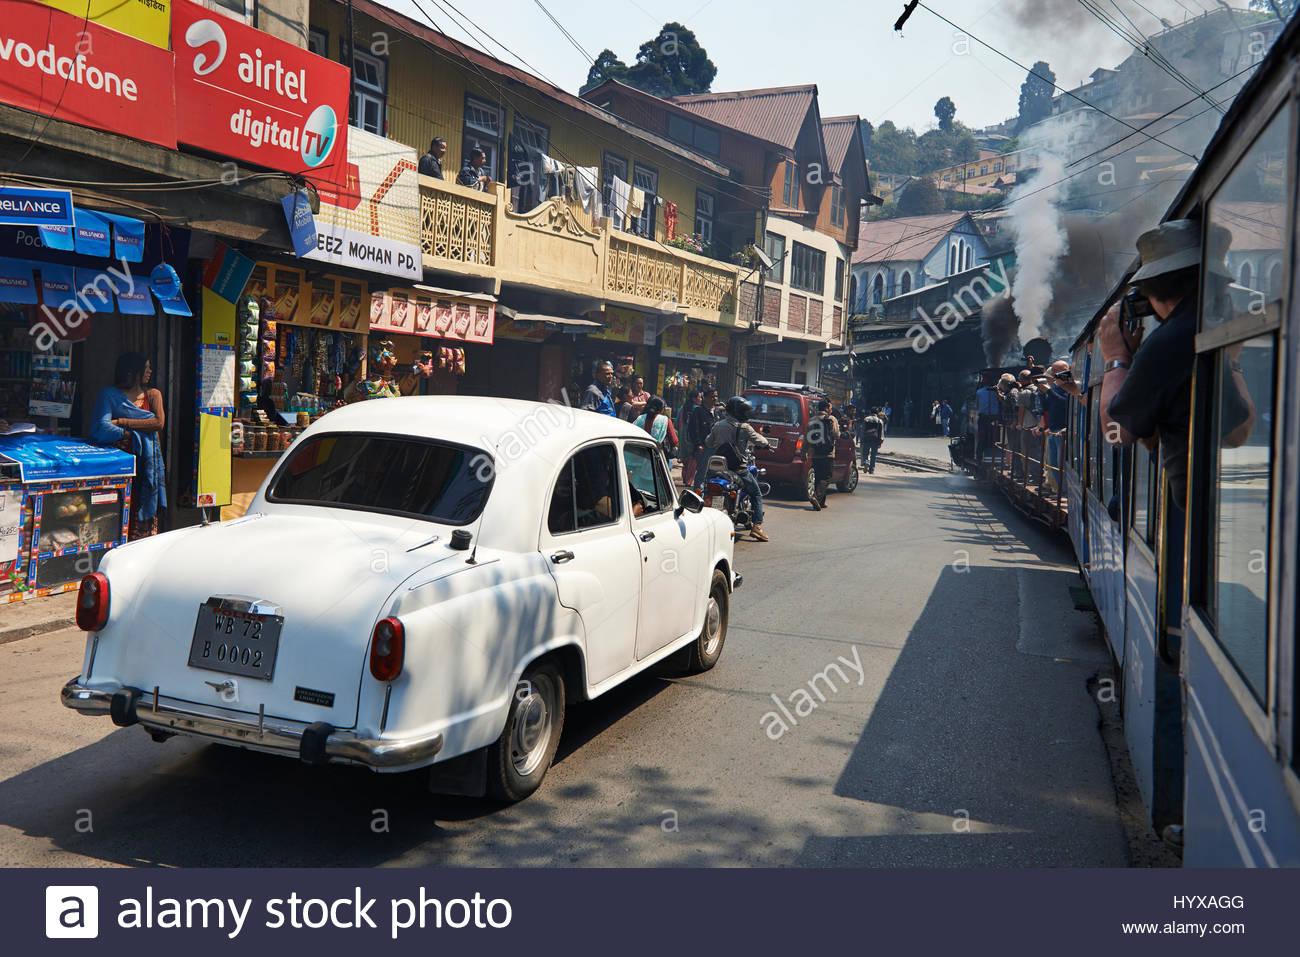 A Hindustan Ambassador, a car manufactured by Hindustan Motors of India, drives down a street alongside the Darjeeling - Stock Image